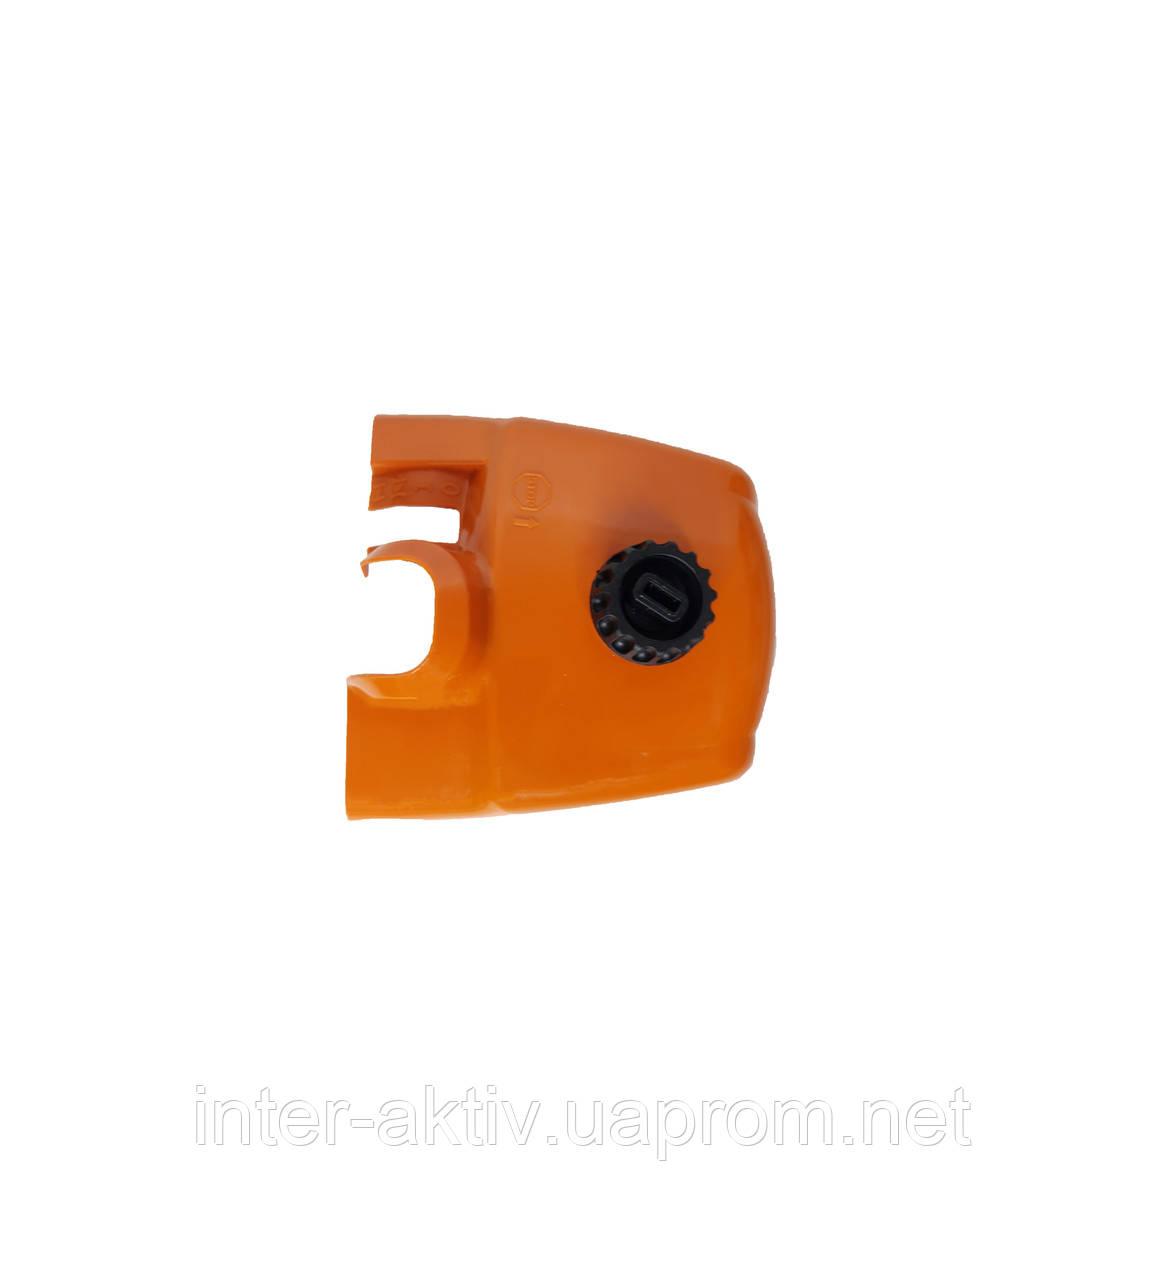 Крышка воздушного фильтра на бензопилу STIHL 361 Kamberg